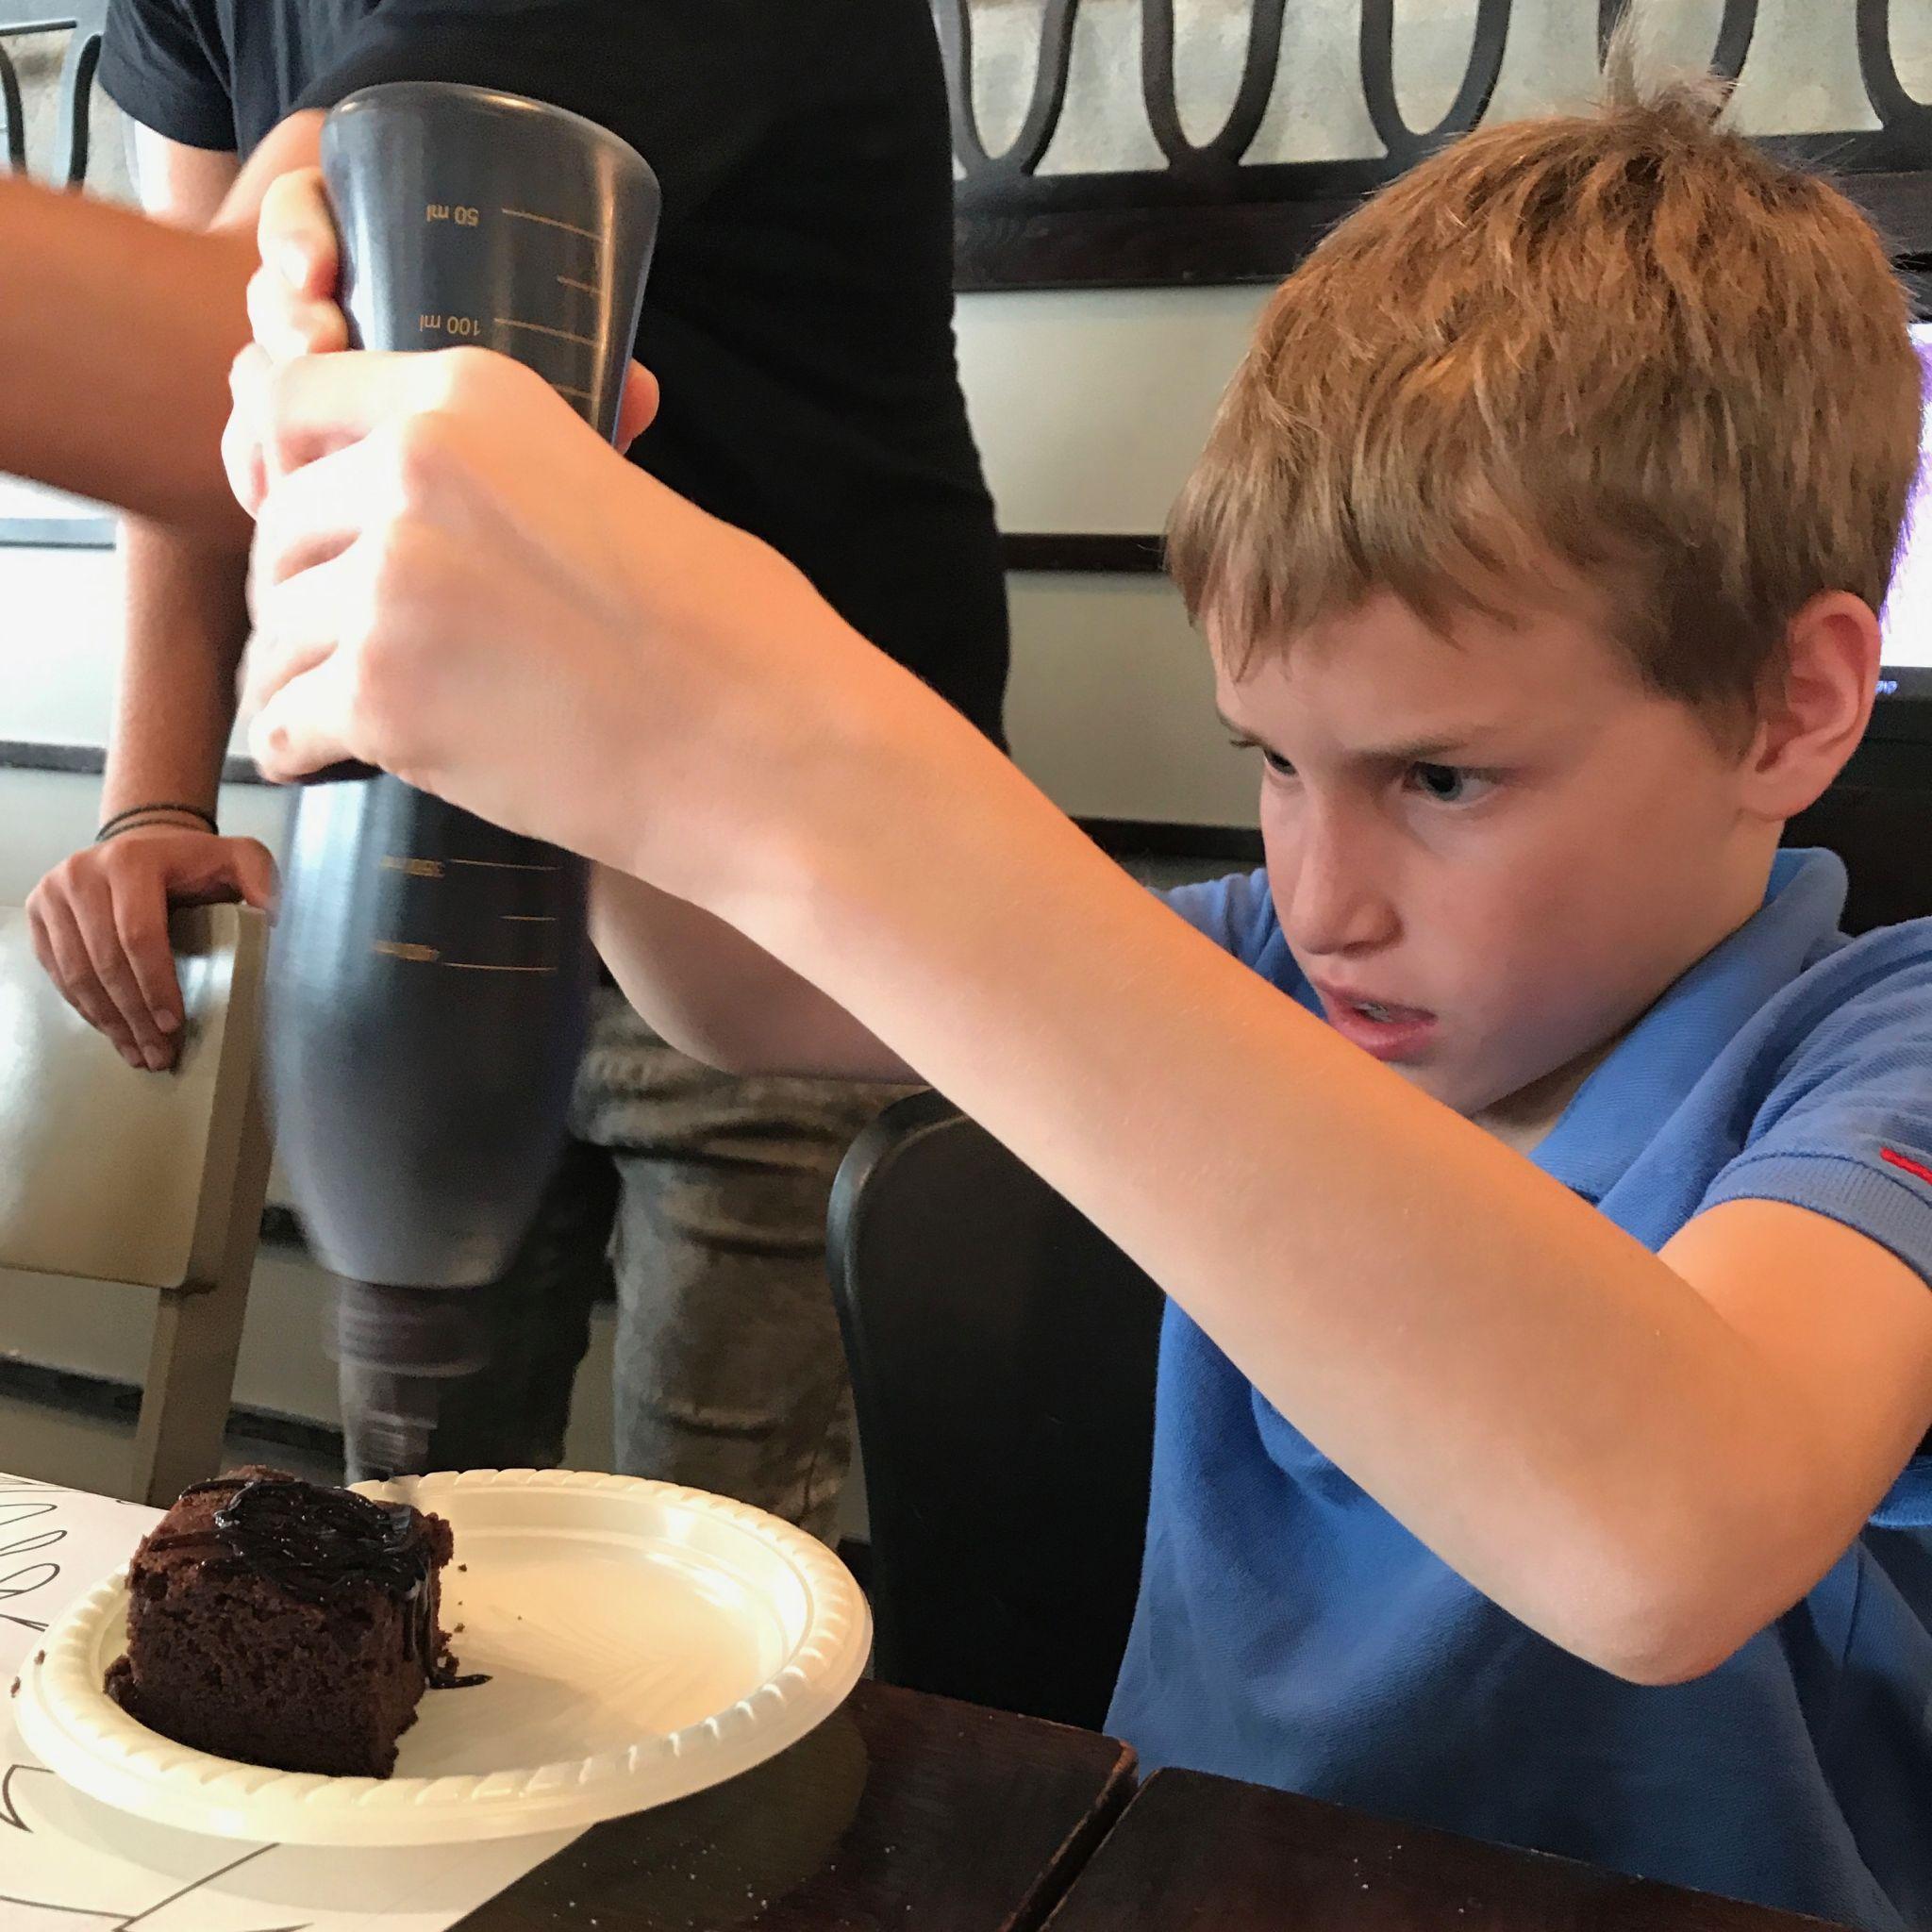 סדנת שף צעיר bbb – 17